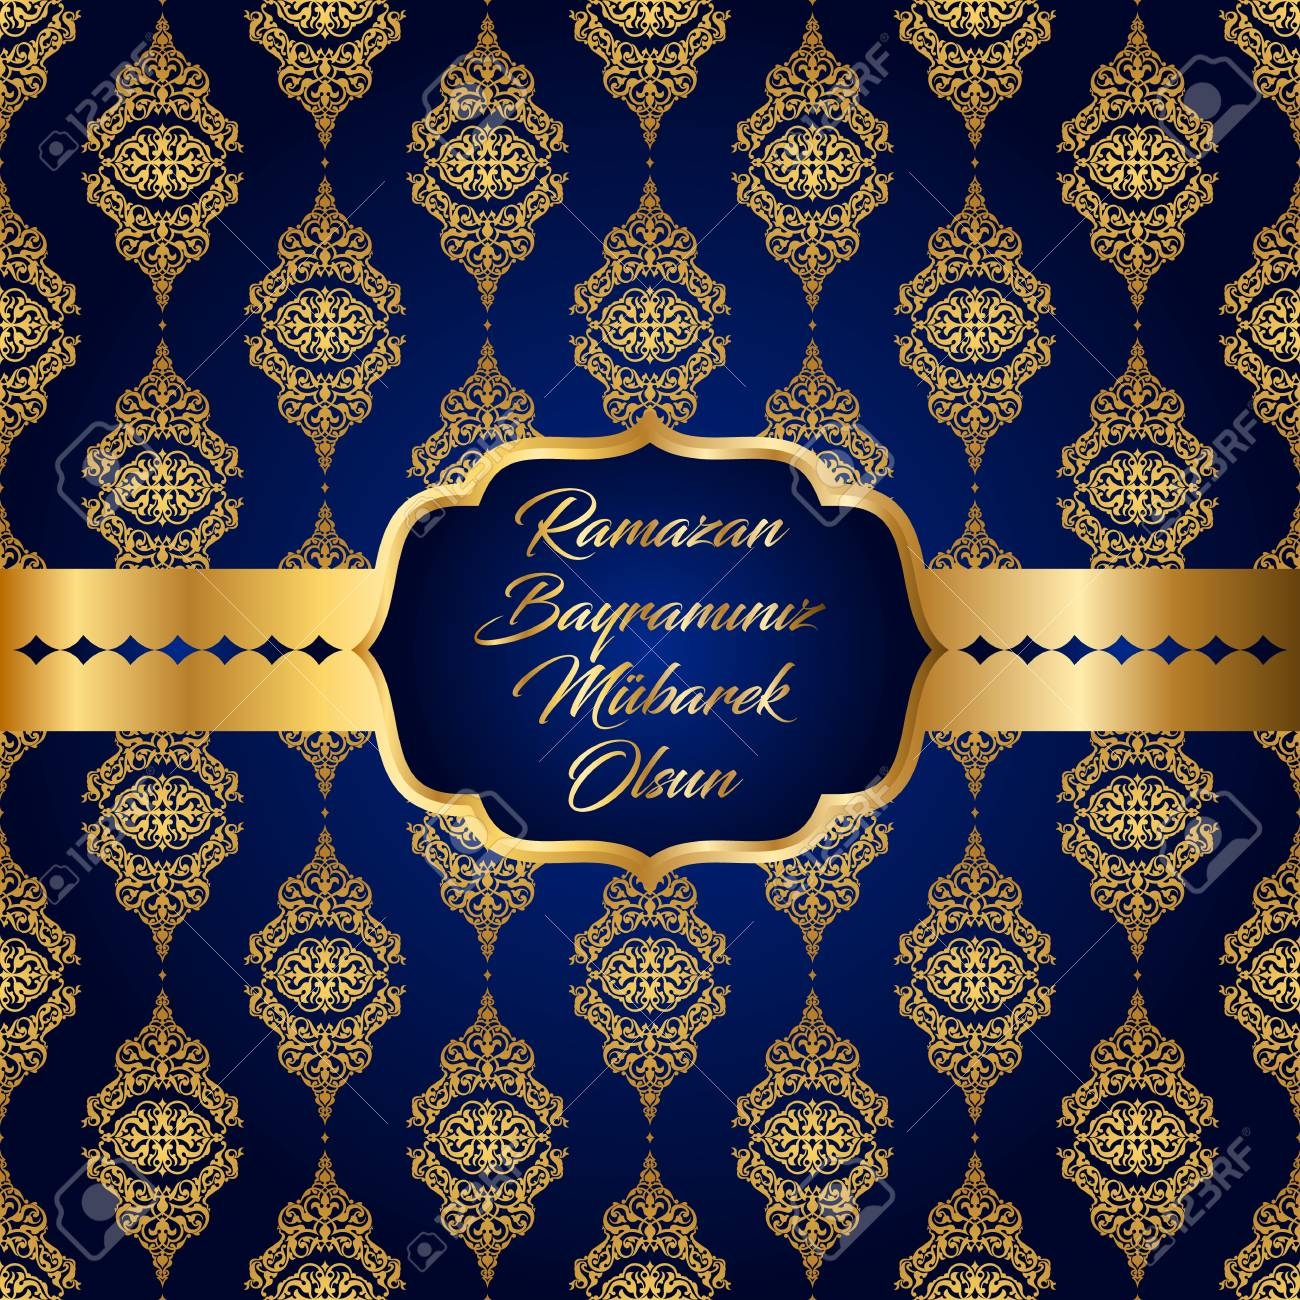 Bless your ramadan feast greeting card turkish ramazan bayramuz bless your ramadan feast greeting card turkish ramazan bayramuz mubarek olsun stock vector m4hsunfo